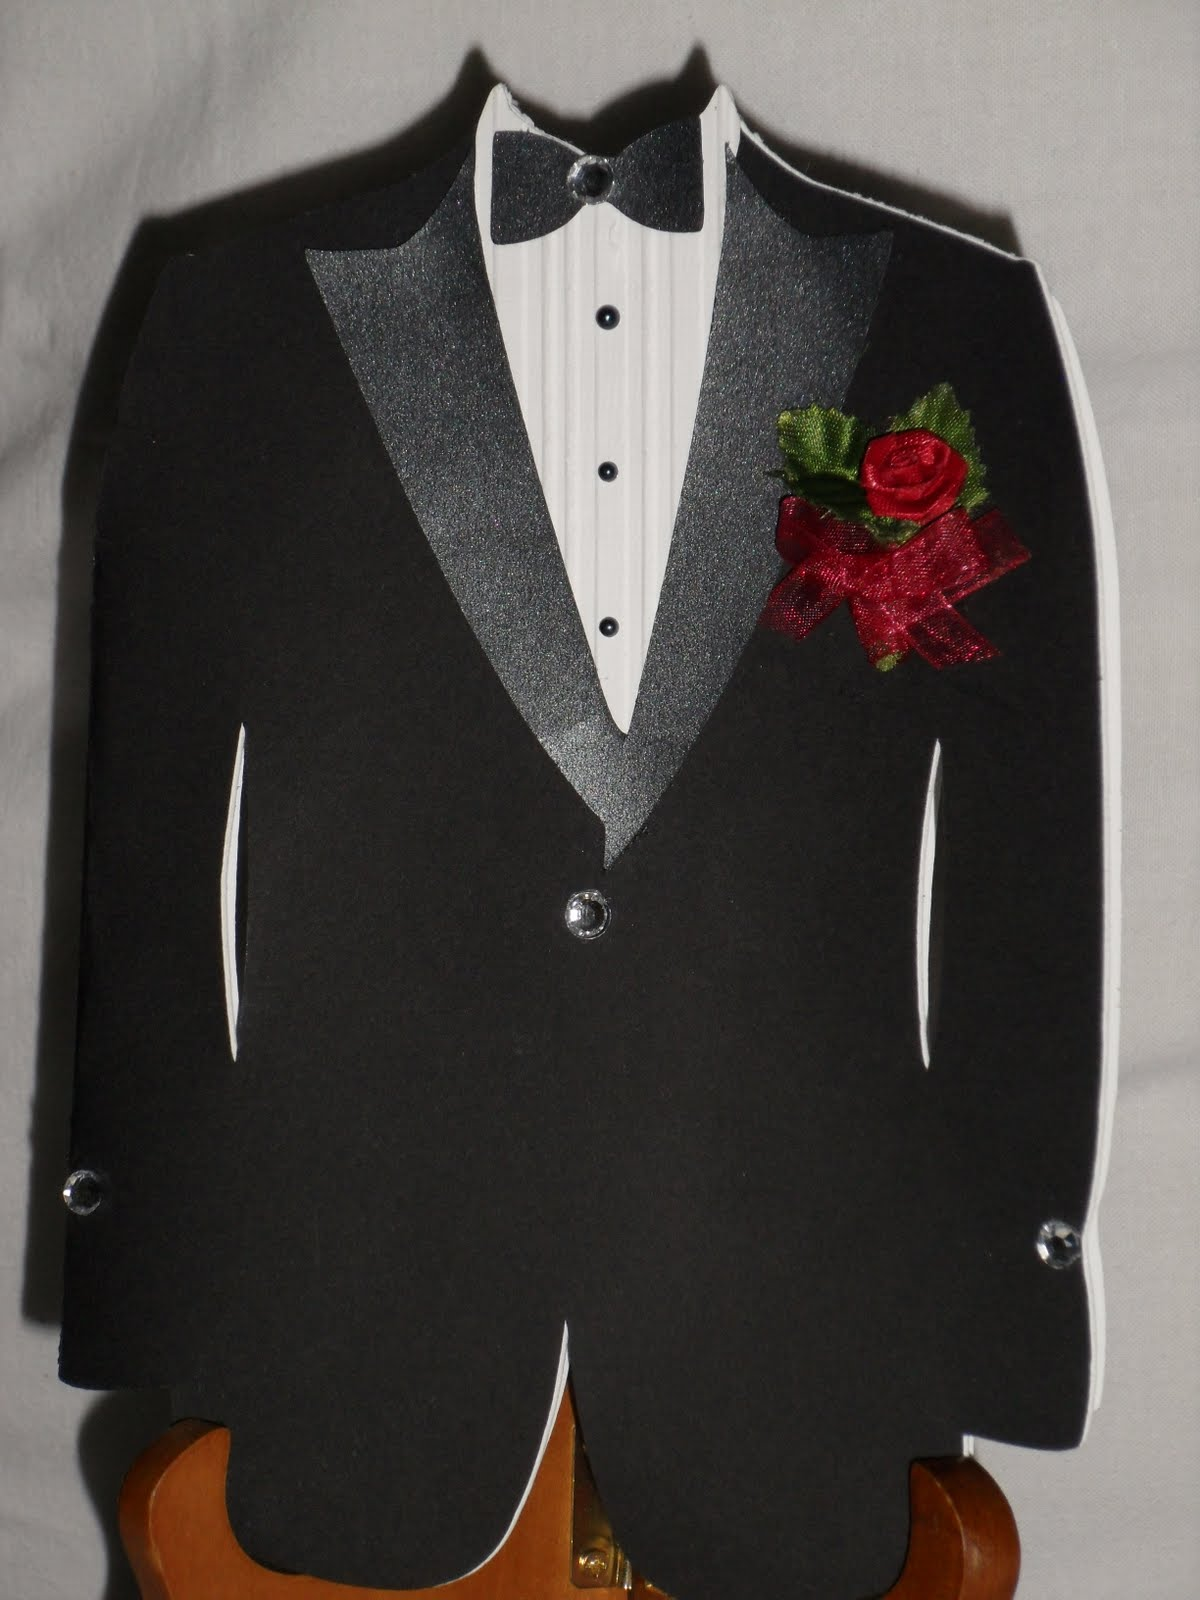 Go Back > Gallery For > Tuxedo Template: imgarcade.com/1/tuxedo-template